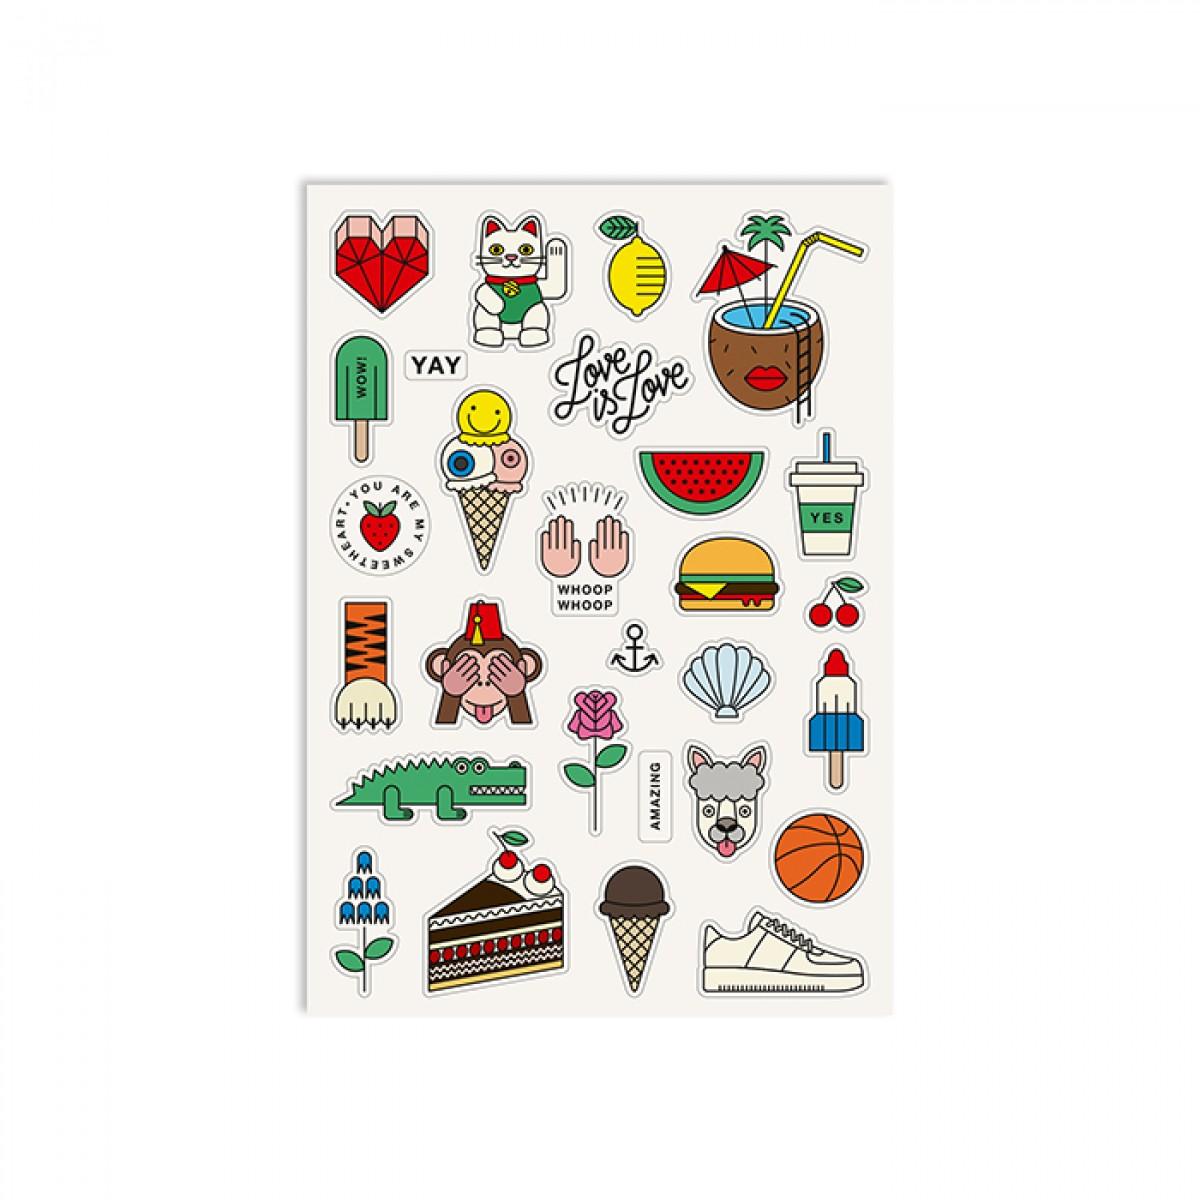 redfries stickers mishmash – 2 Stück Aufkleberbögen DIN A5